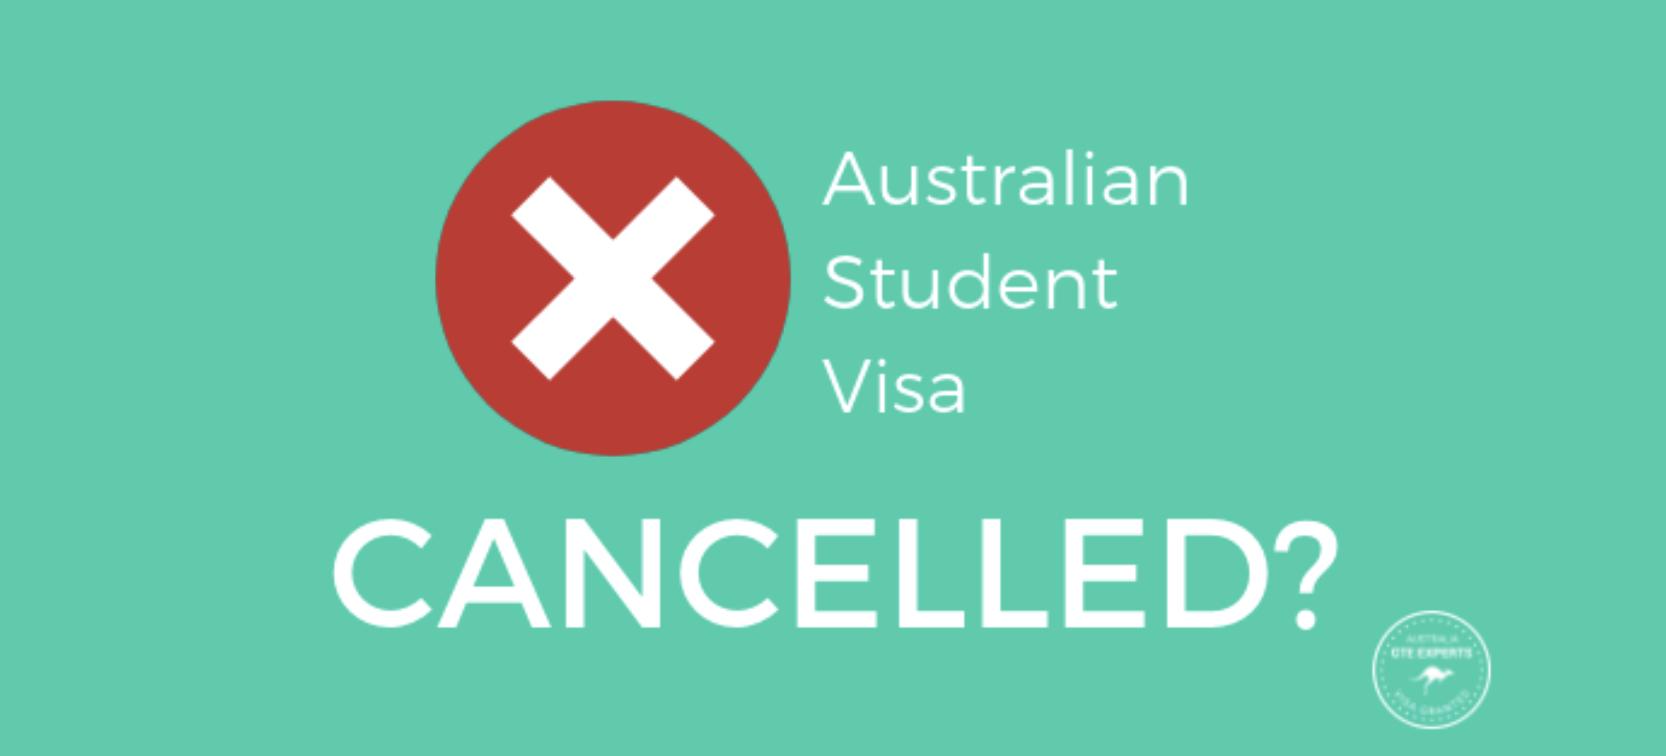 Australian student visa cancelled